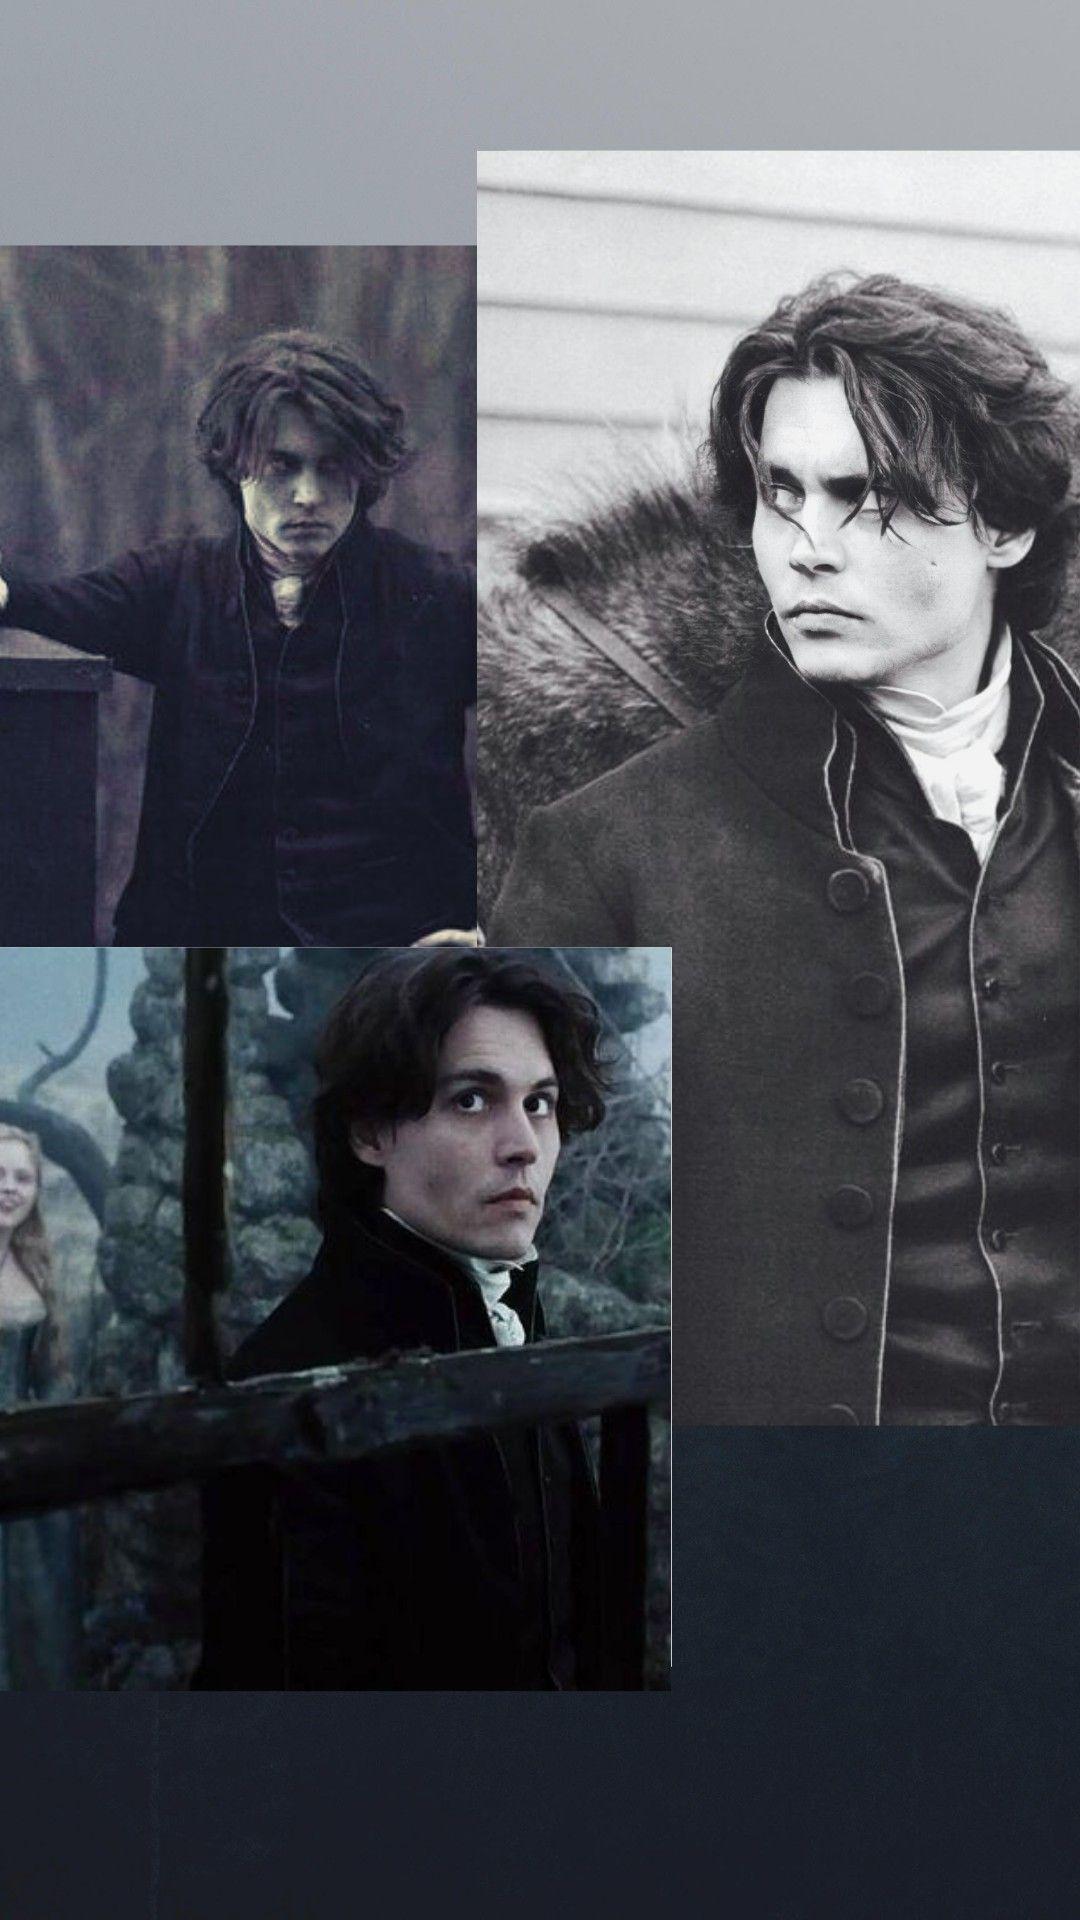 Johnny Depp Wallpaper Johnny Depp Wallpaper Young Johnny Depp Johnny Depp